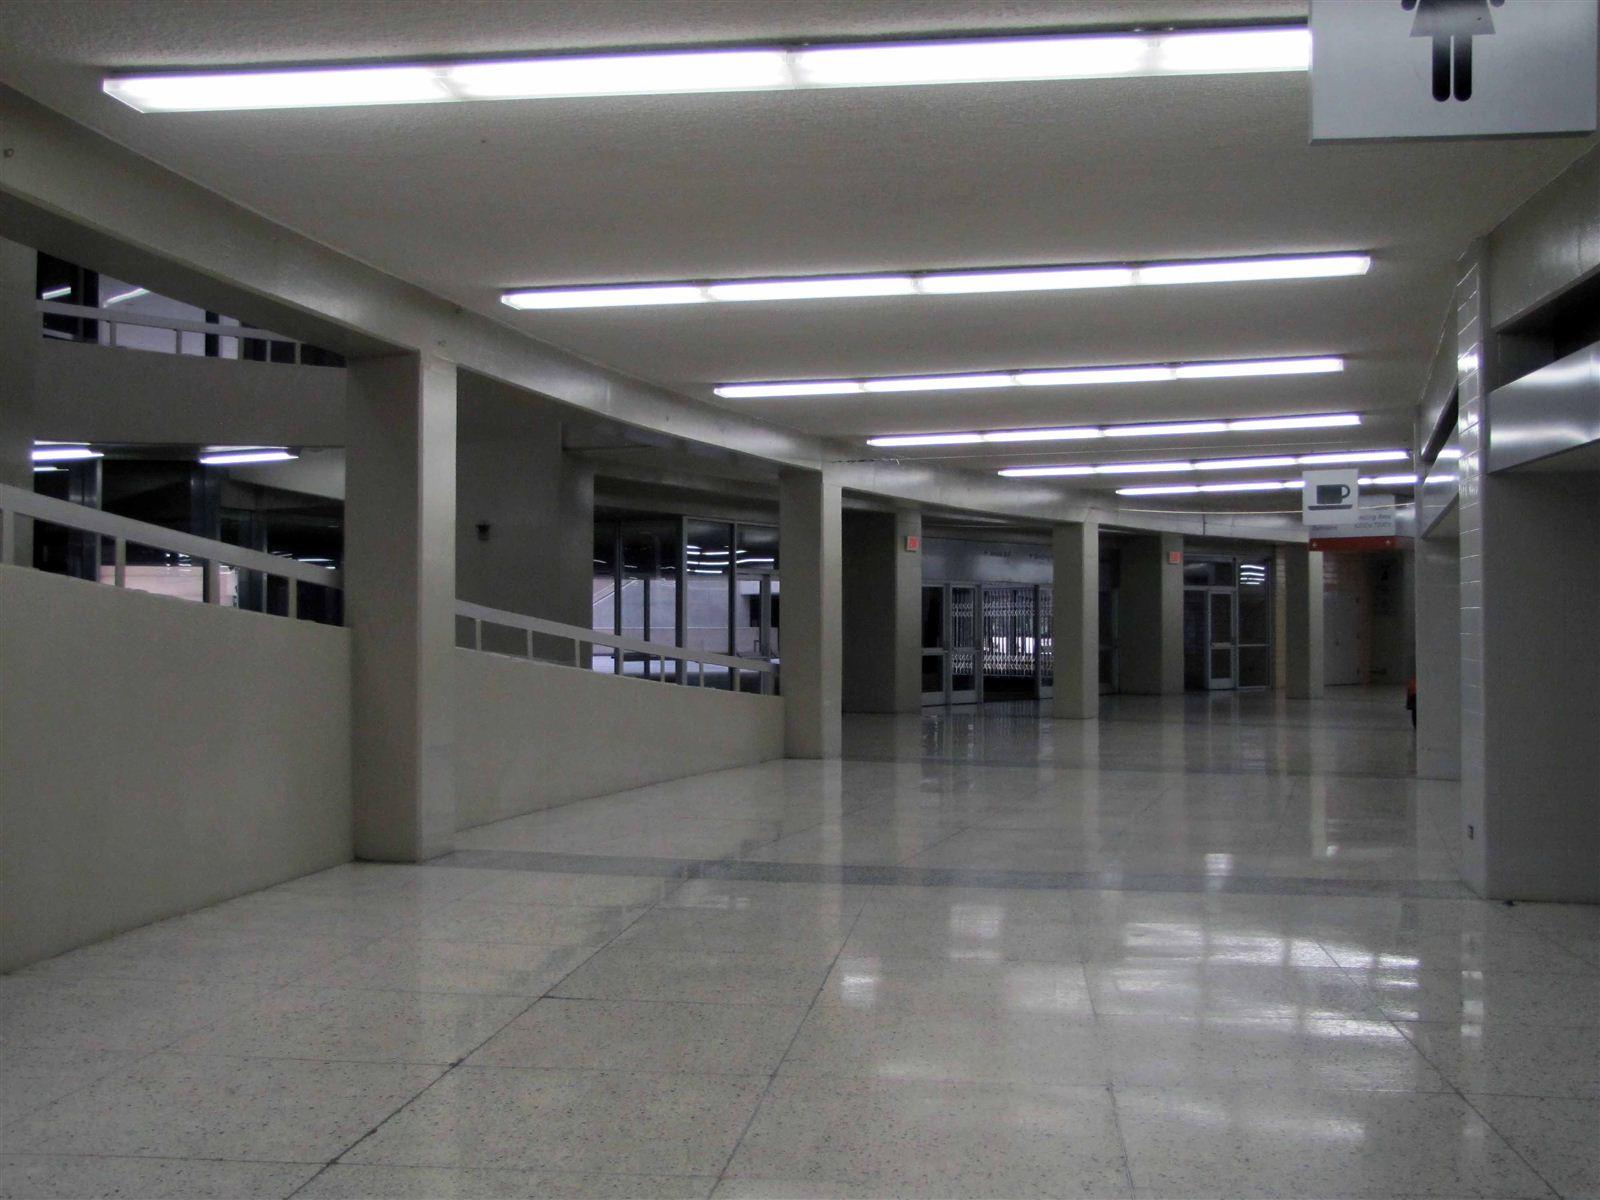 Location Photos Of Dallas Convention Center Arena